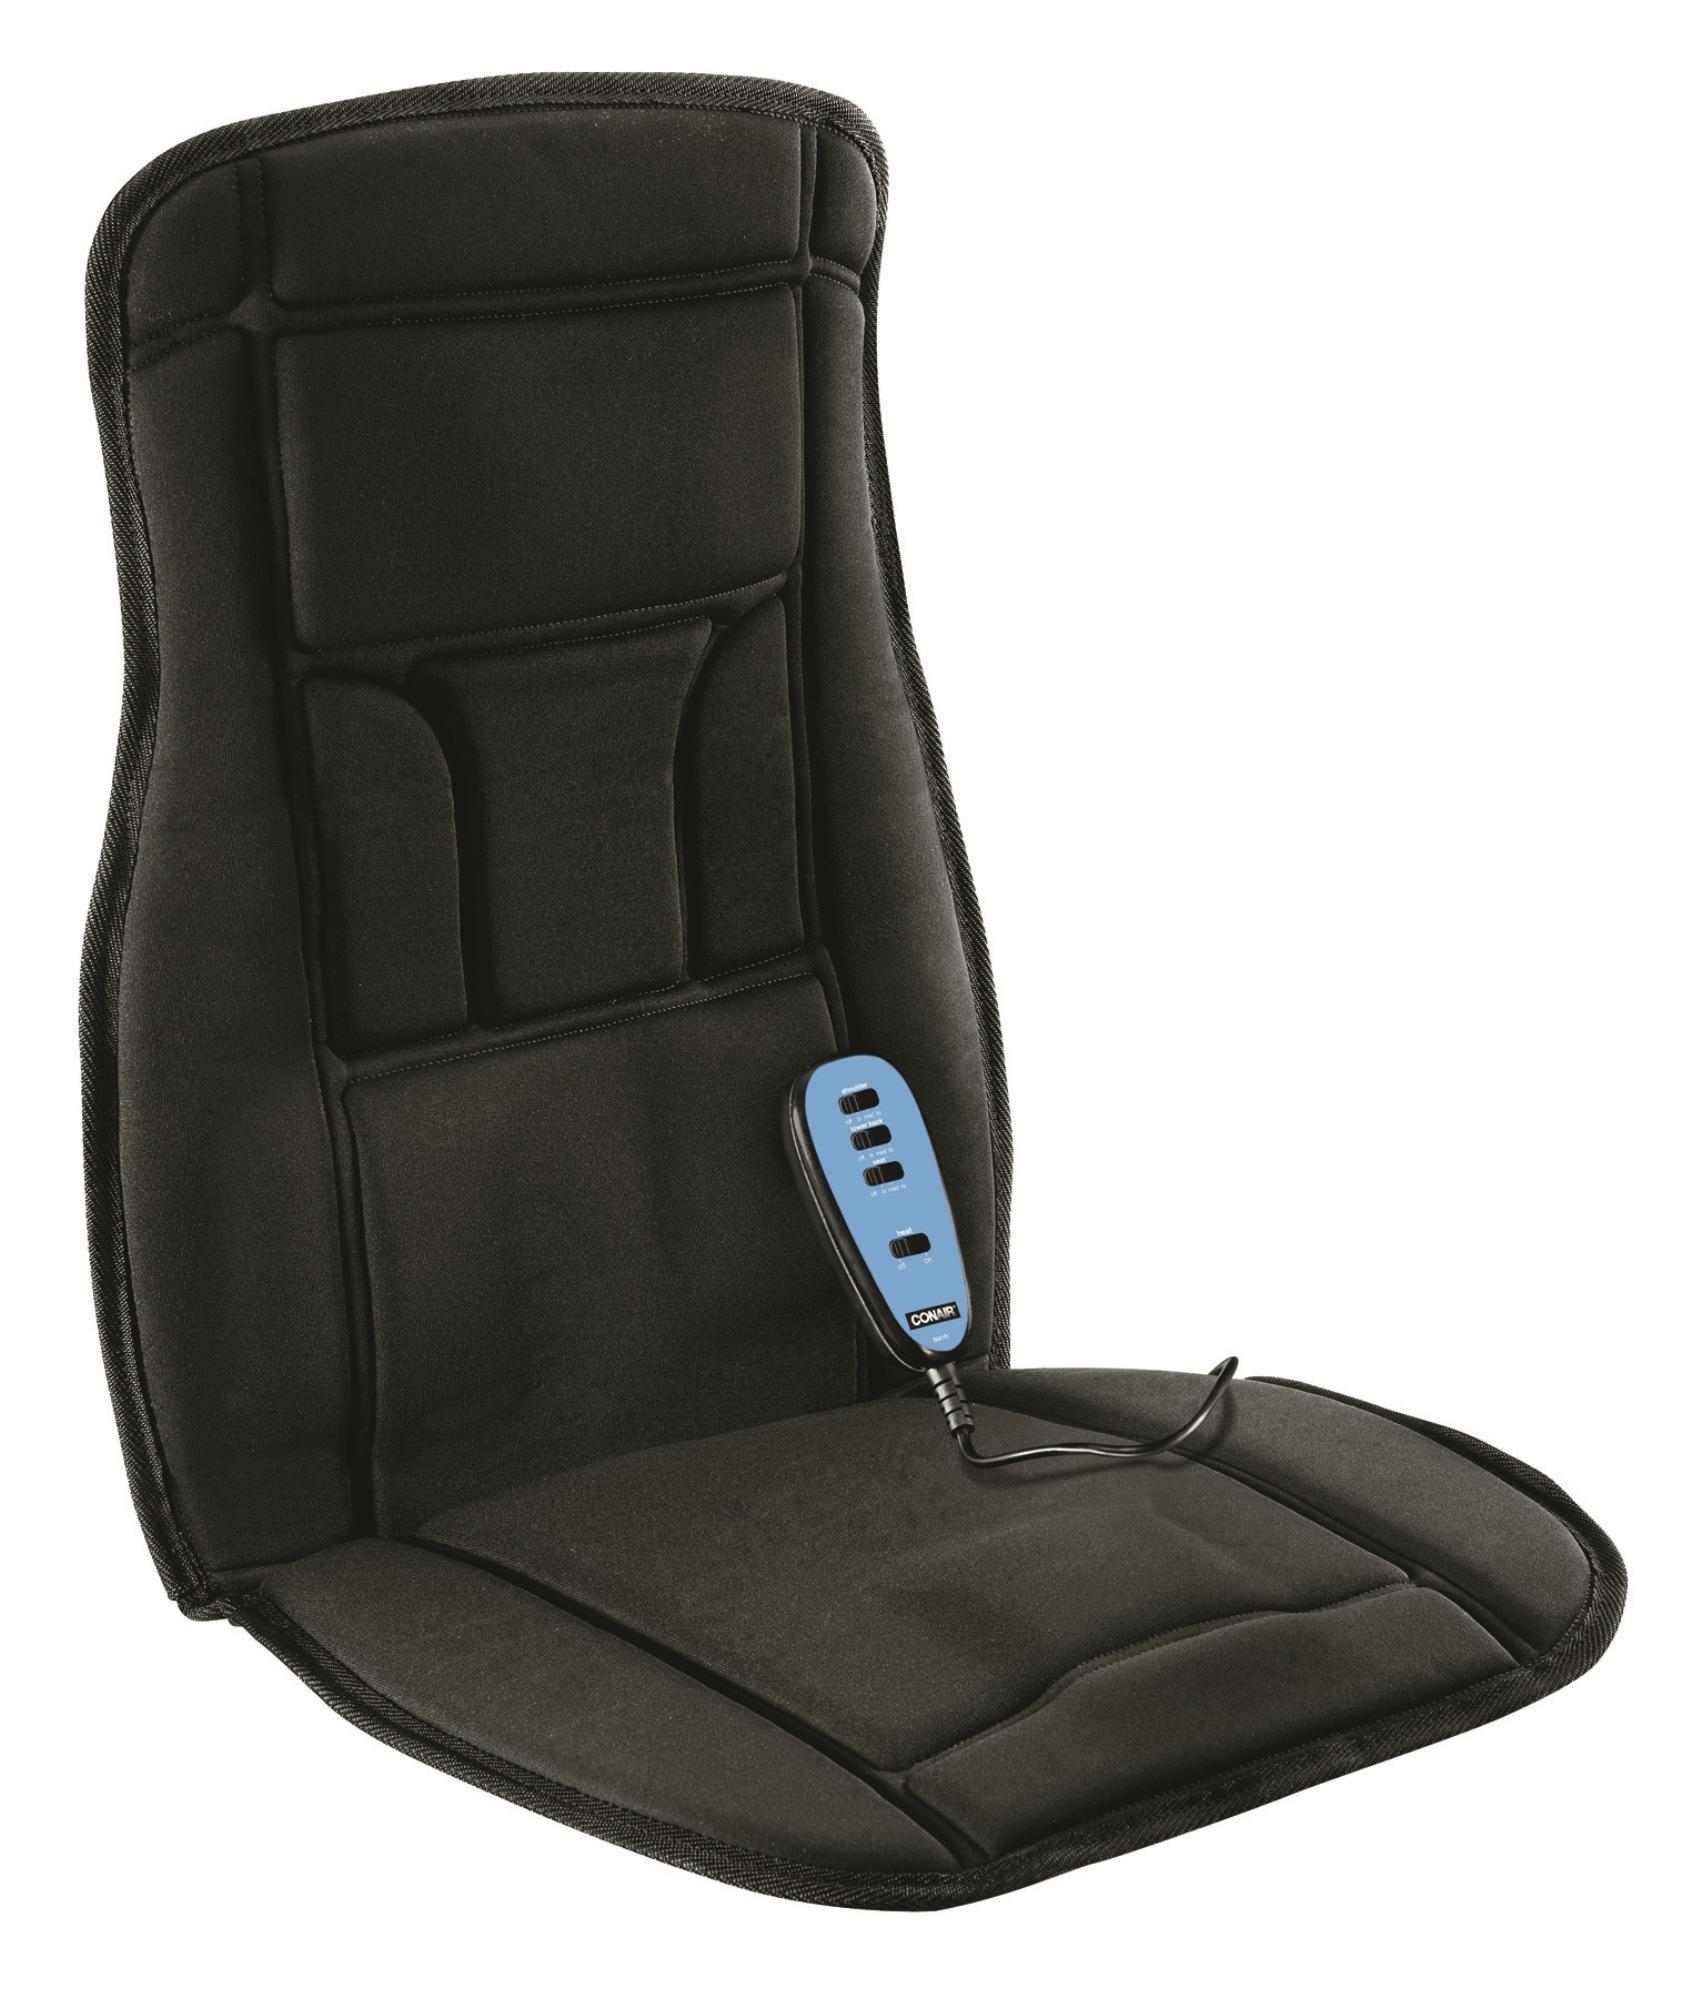 Conair Heated Massaging Seat Cushion